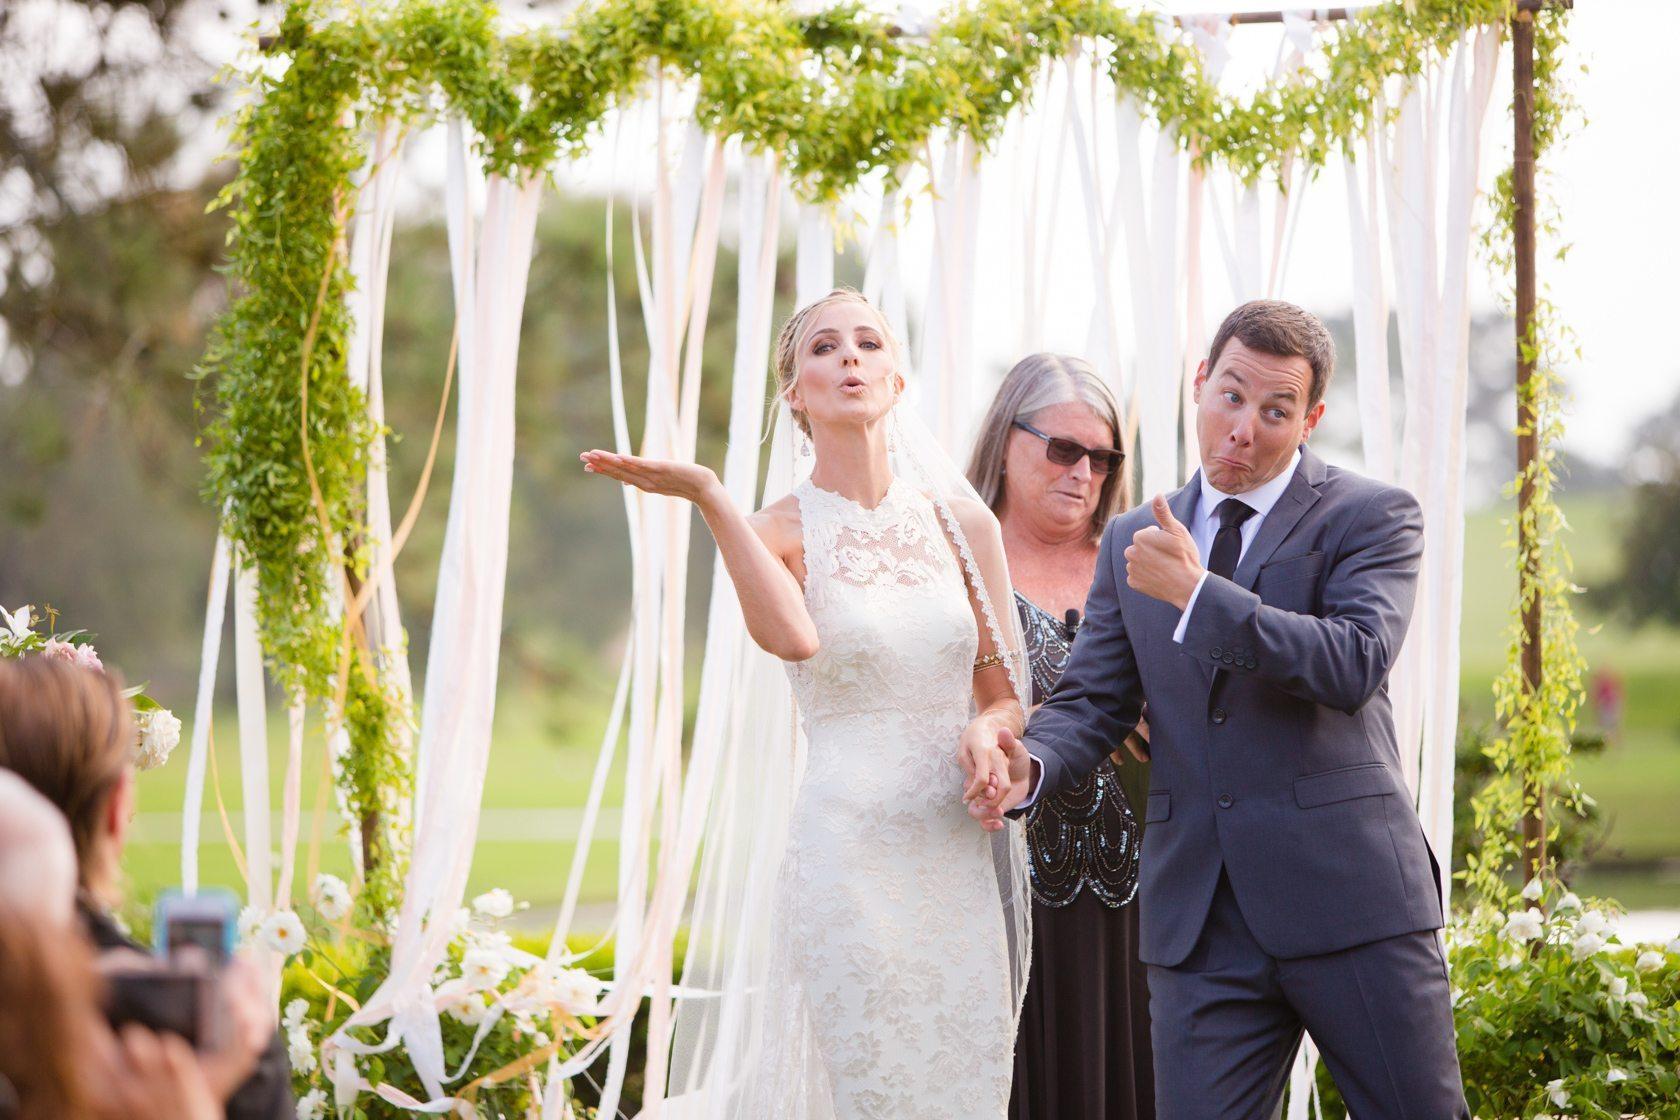 The_Lodge_at_Torrey_Pines_Wedding_050.jpg